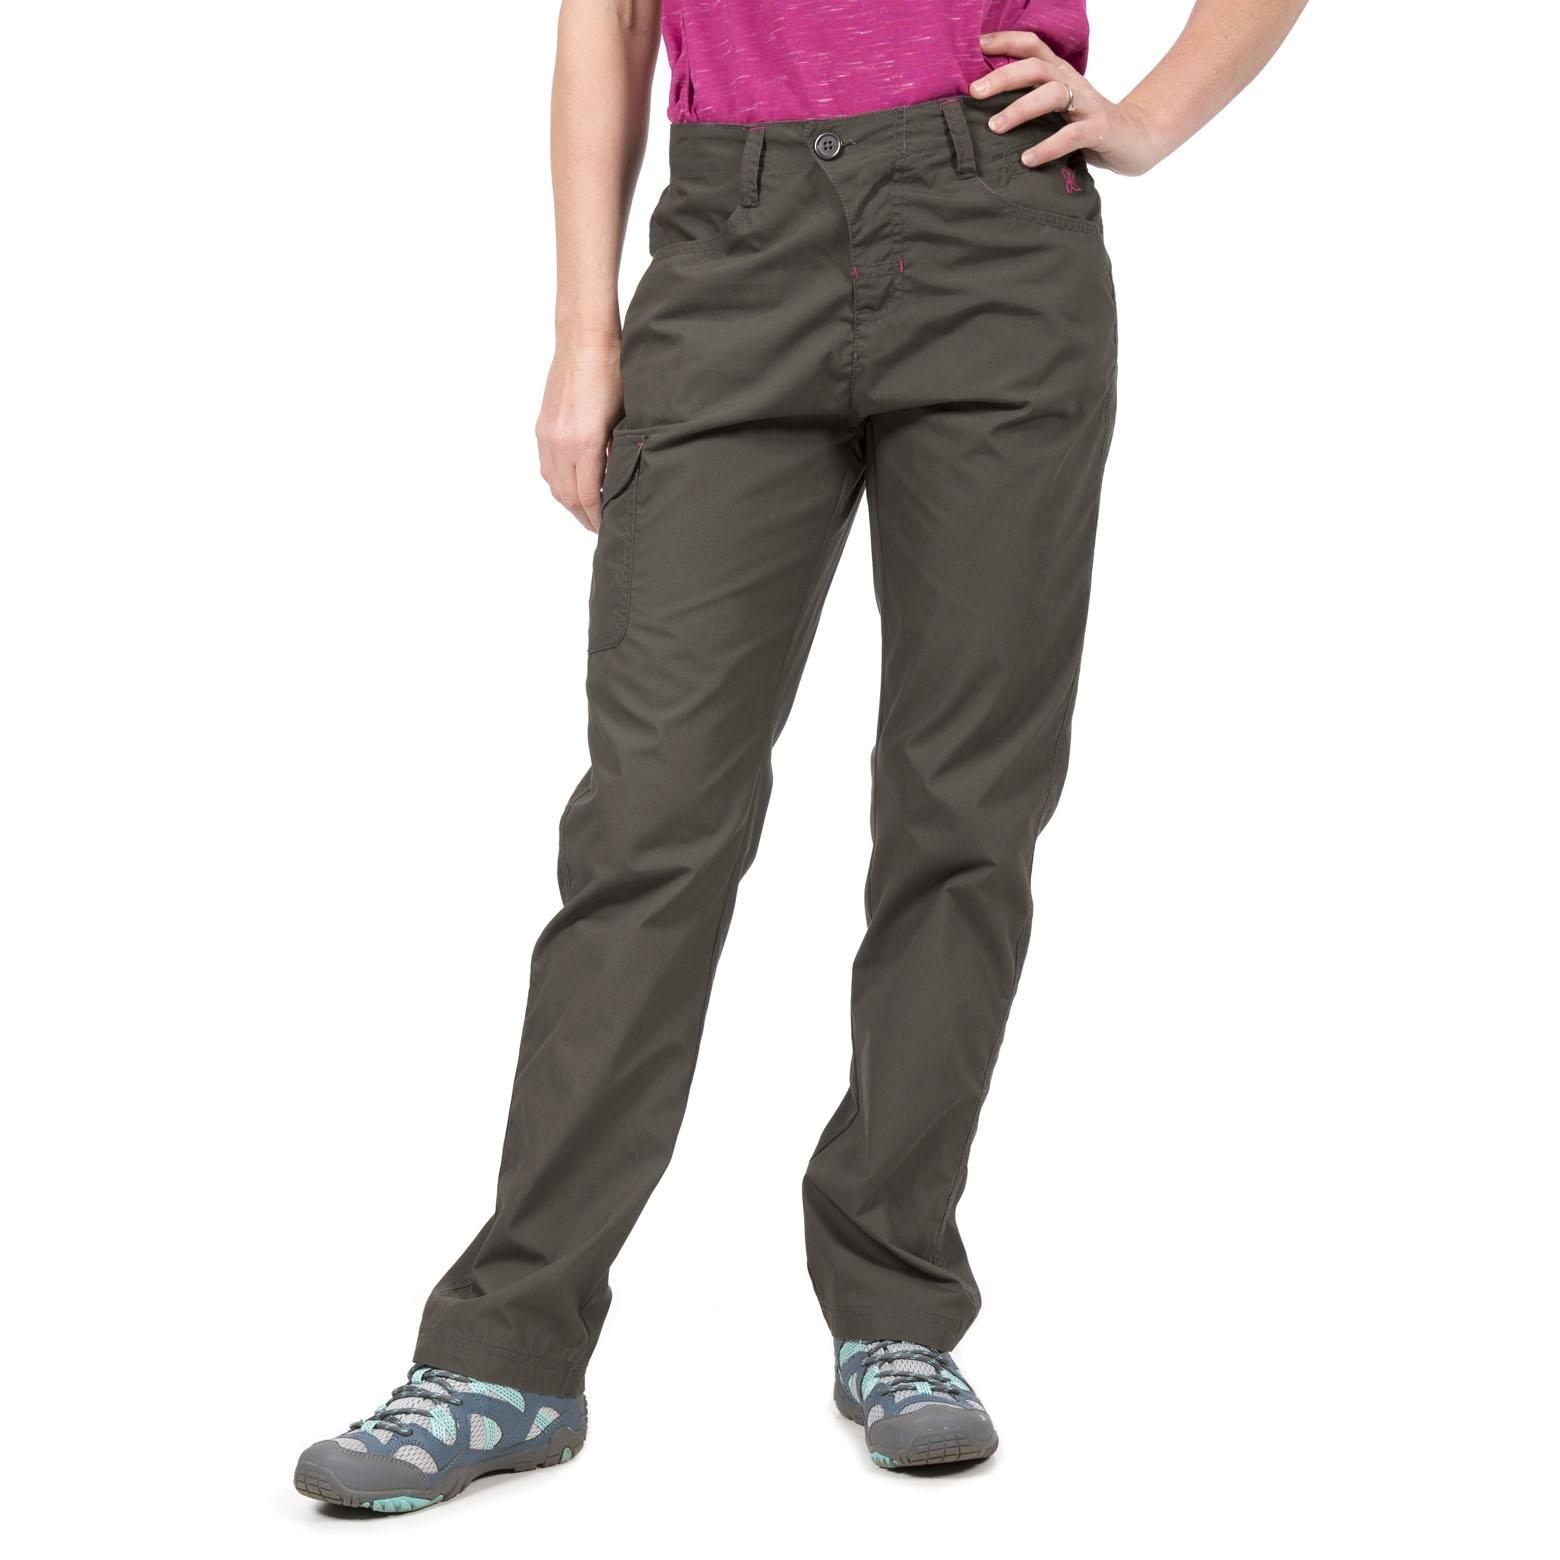 Trespass Rambler Womens Walking Trousers Hiking Pants with 5 Pockets